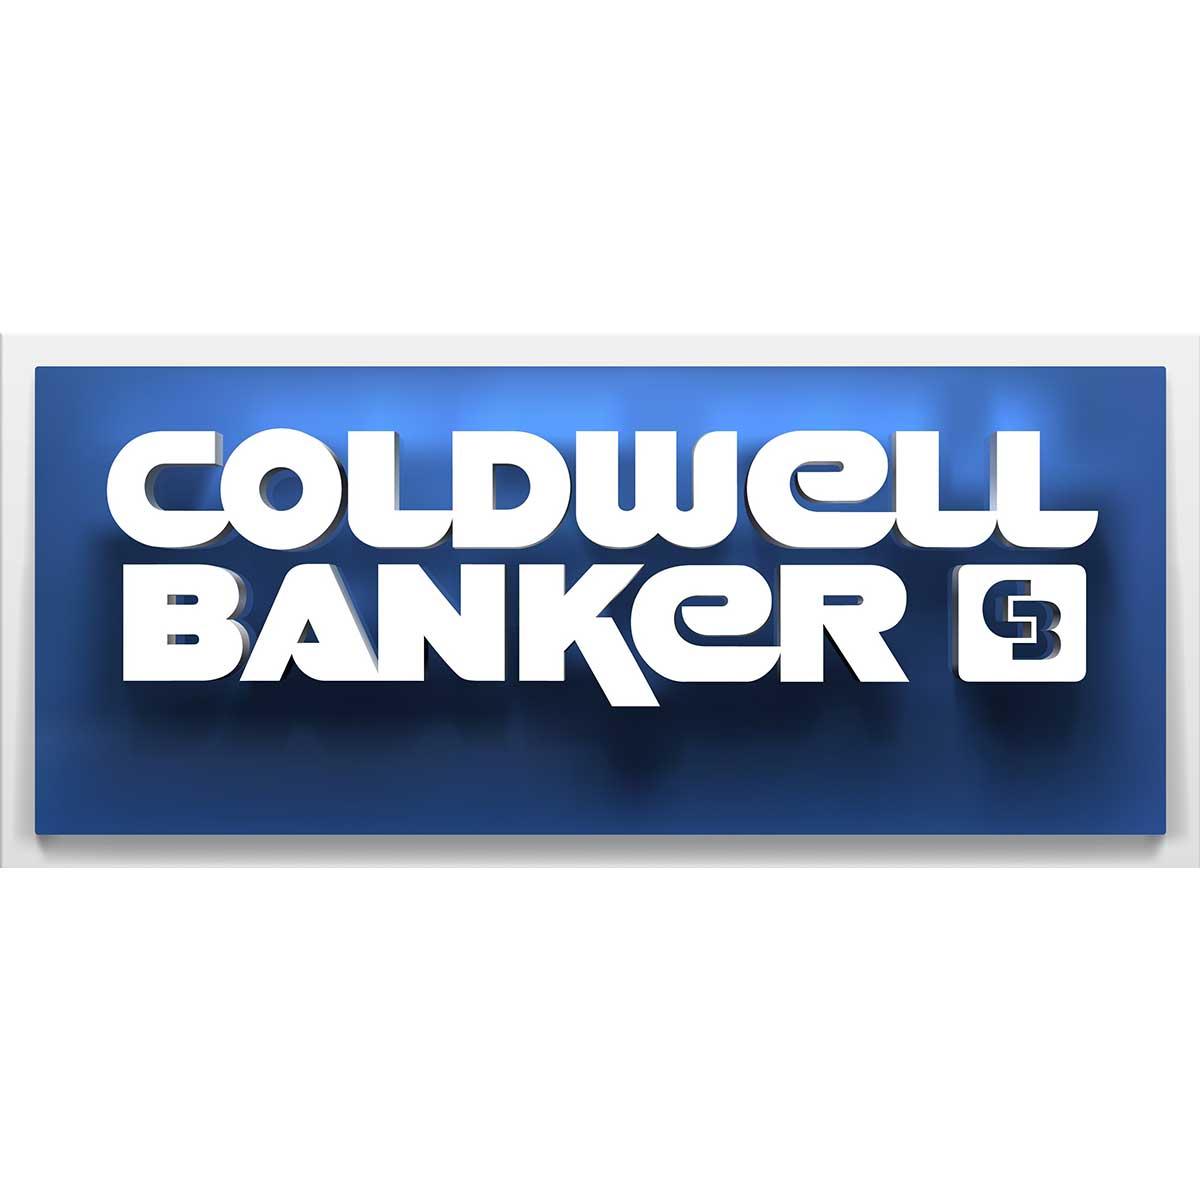 Coldwell Banker Mary Straka